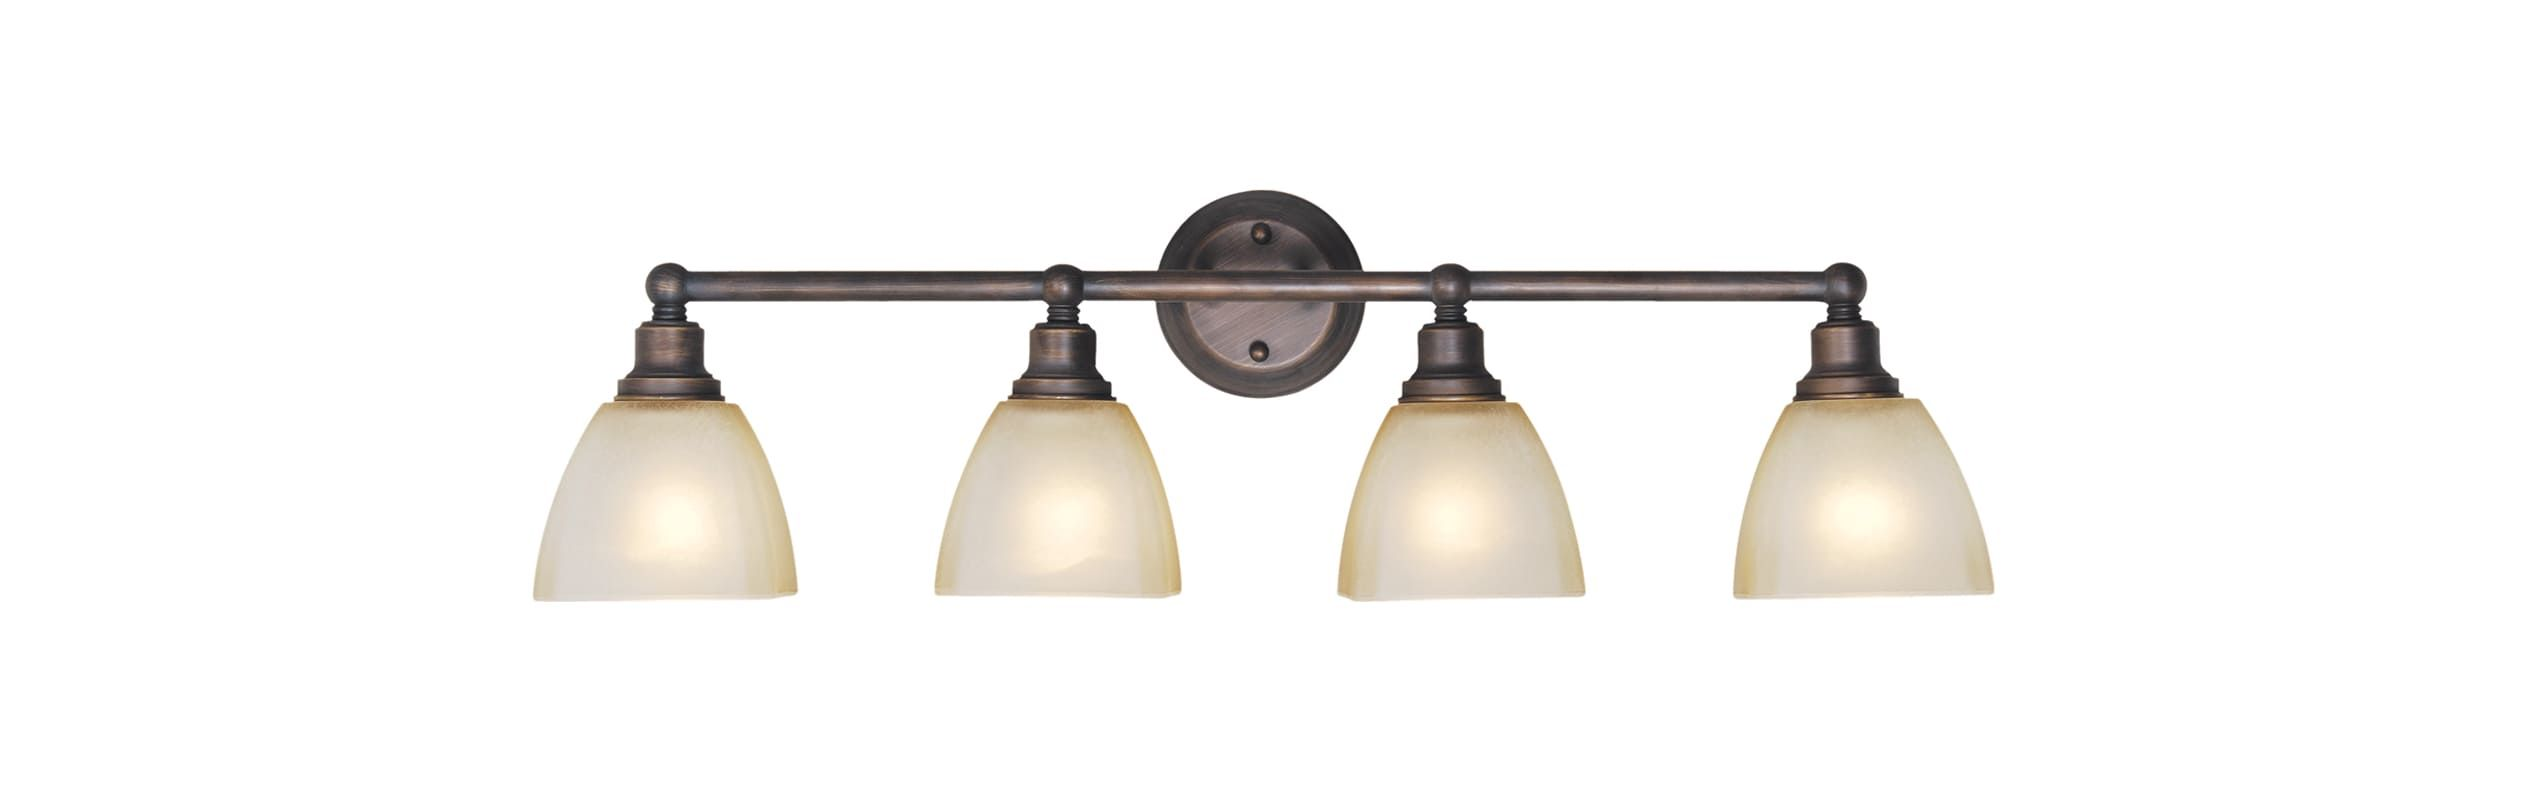 Photo of Craftmade 26604-BZ Bronze Bradley 4 Light Bathroom Vanity Light – 32.65 Inches Wide